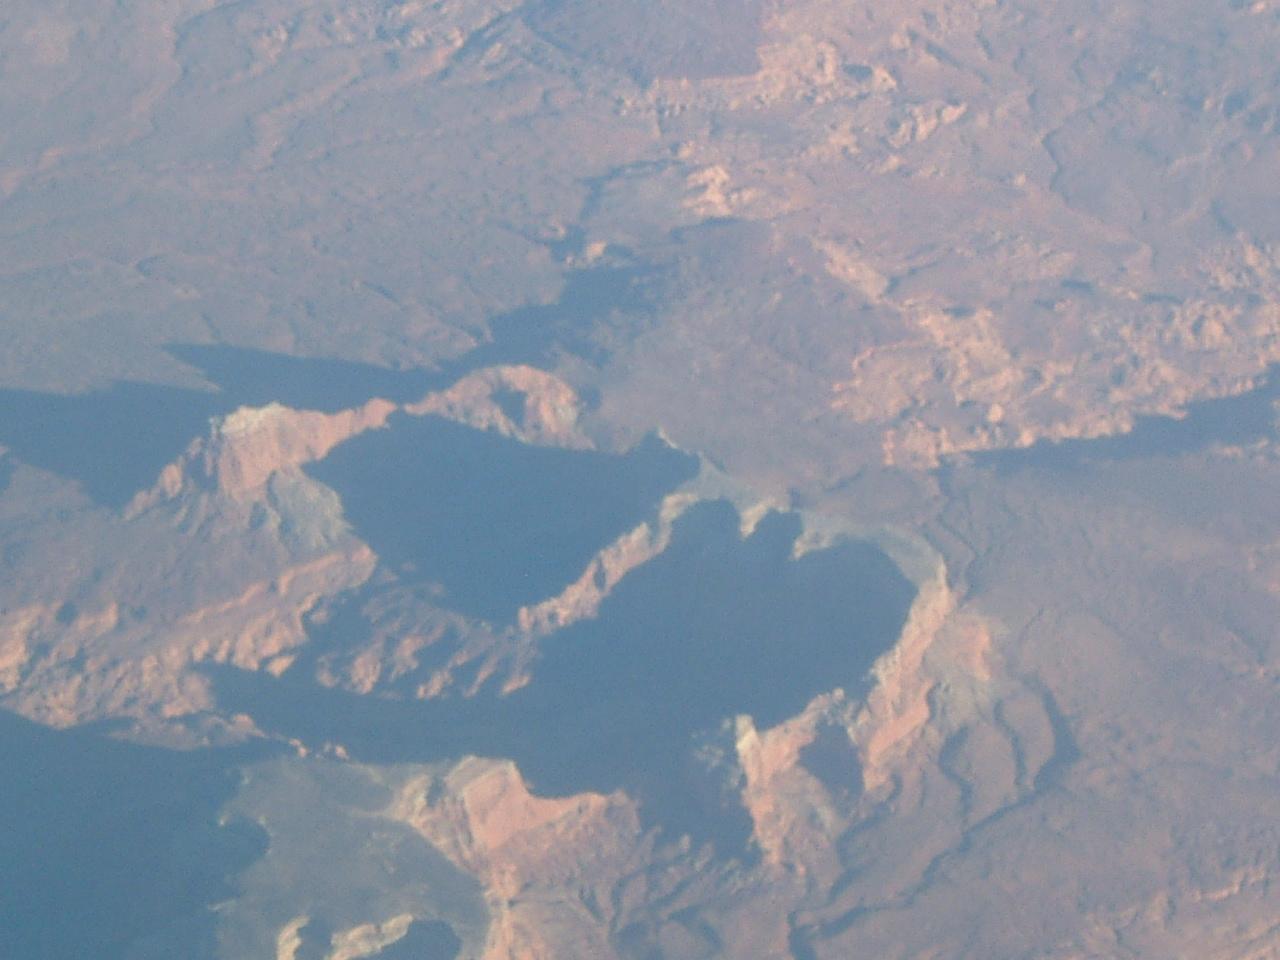 Somewhere between Nevada and Utah